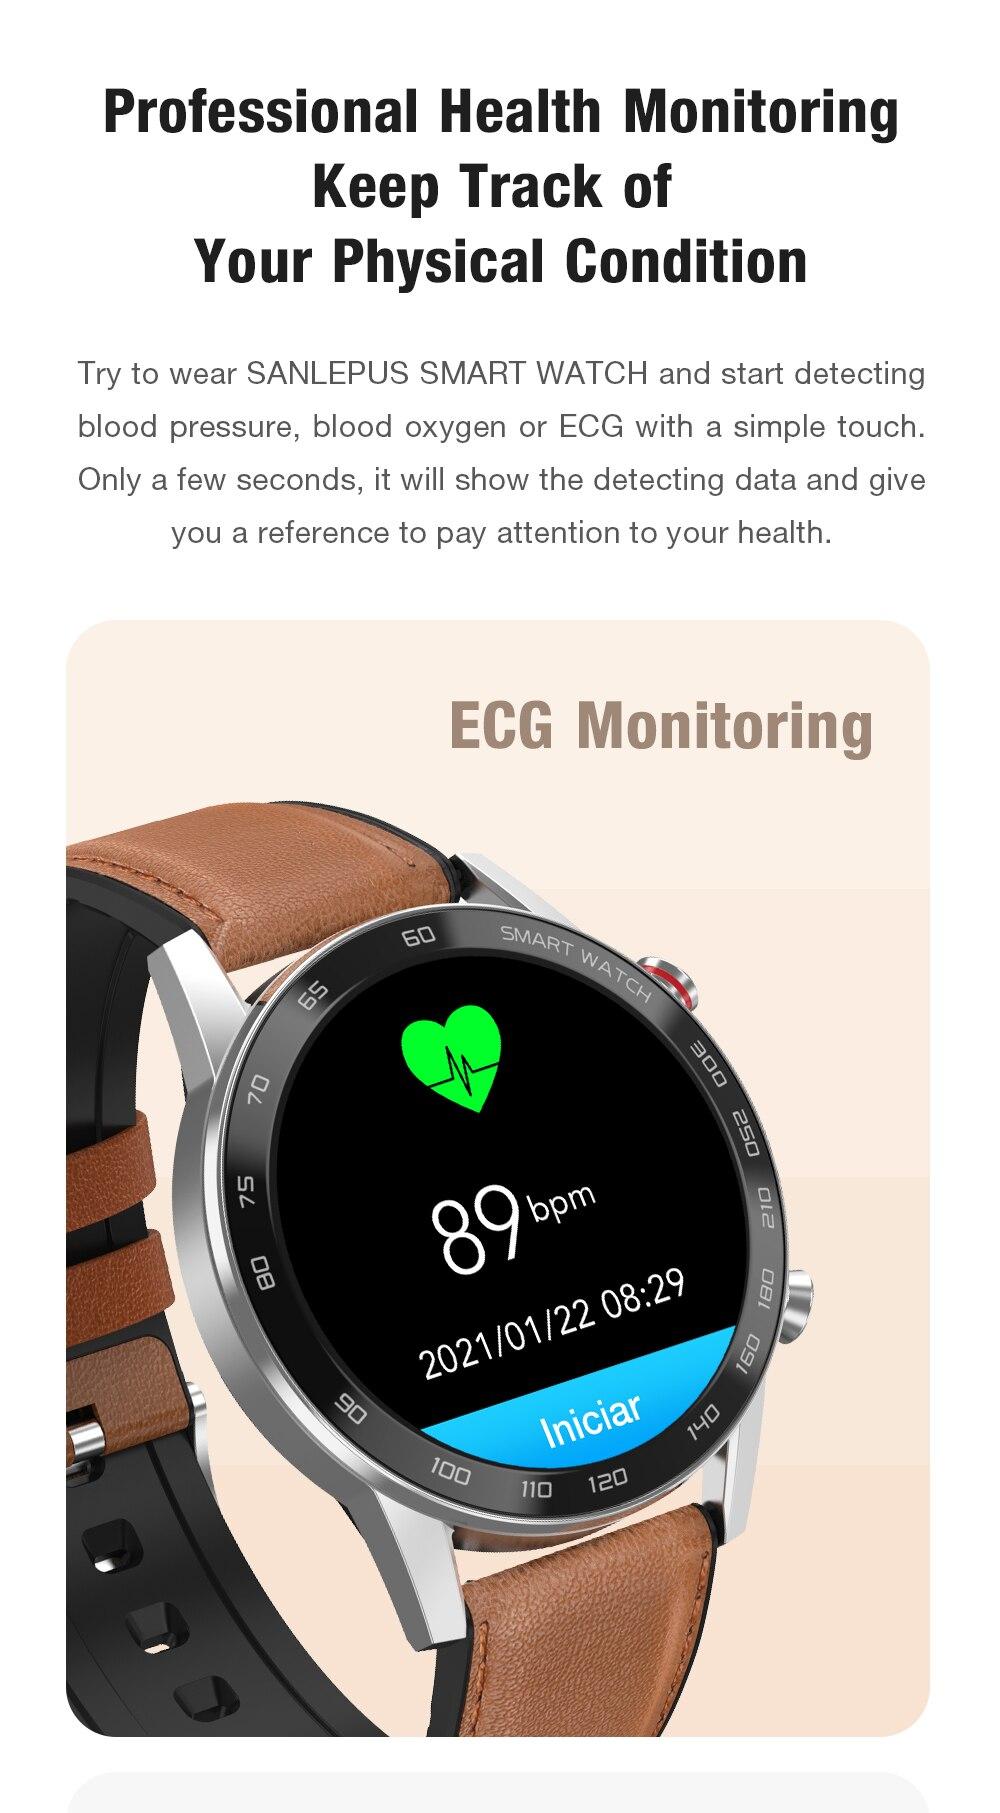 H96ca2a276ecf428098aca75c8a5703b6H 2021 SANLEPUS ECG Smart Watch Dial Call Smartwatch Men Sport Fitness Bracelet Clock Watches For Android Apple Xiaomi